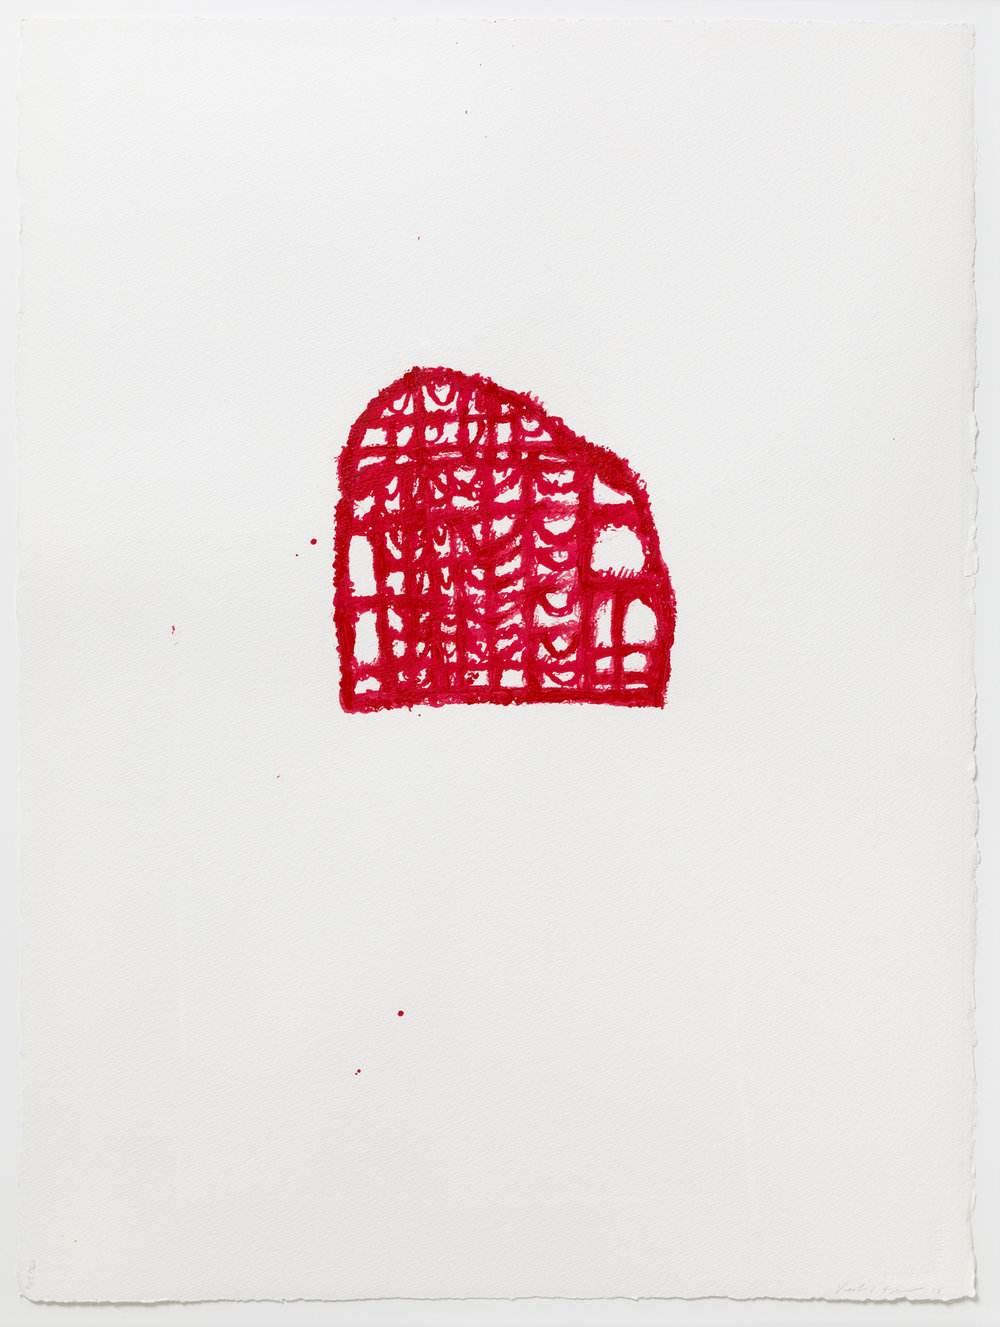 Vadis Turner,  Red Gate Study  (2018). Image by John Schweikert. Courtesy of Zeitgeist Gallery.